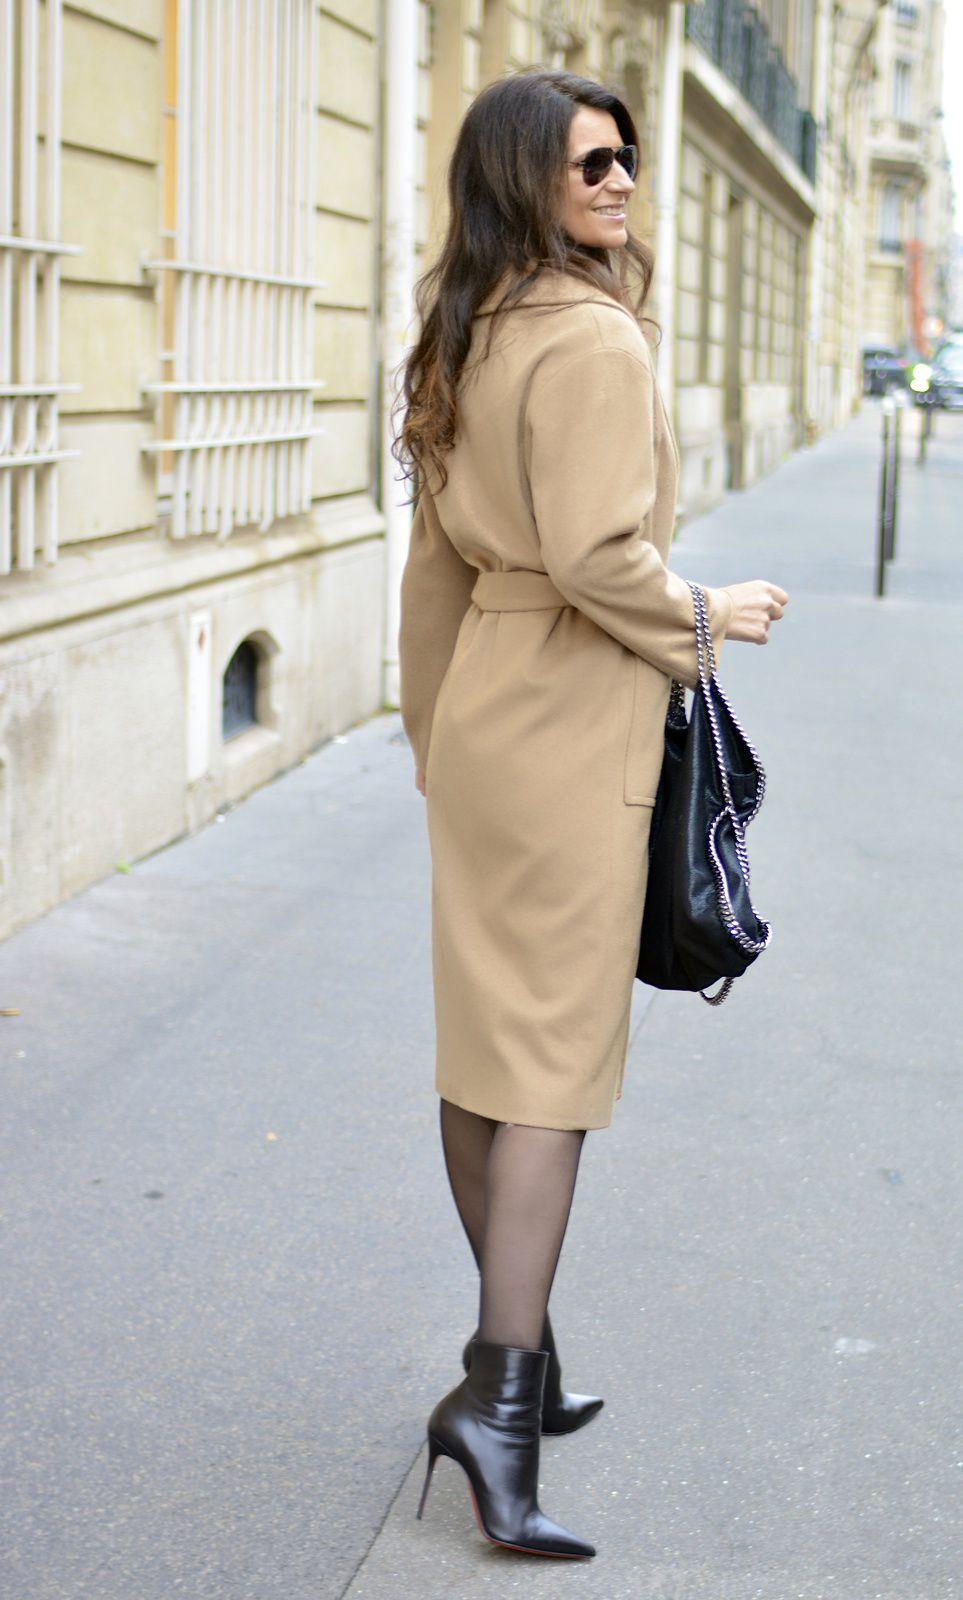 Naty So Votre Manteau French Style By Le Peignoir Adoptez x7wxU4